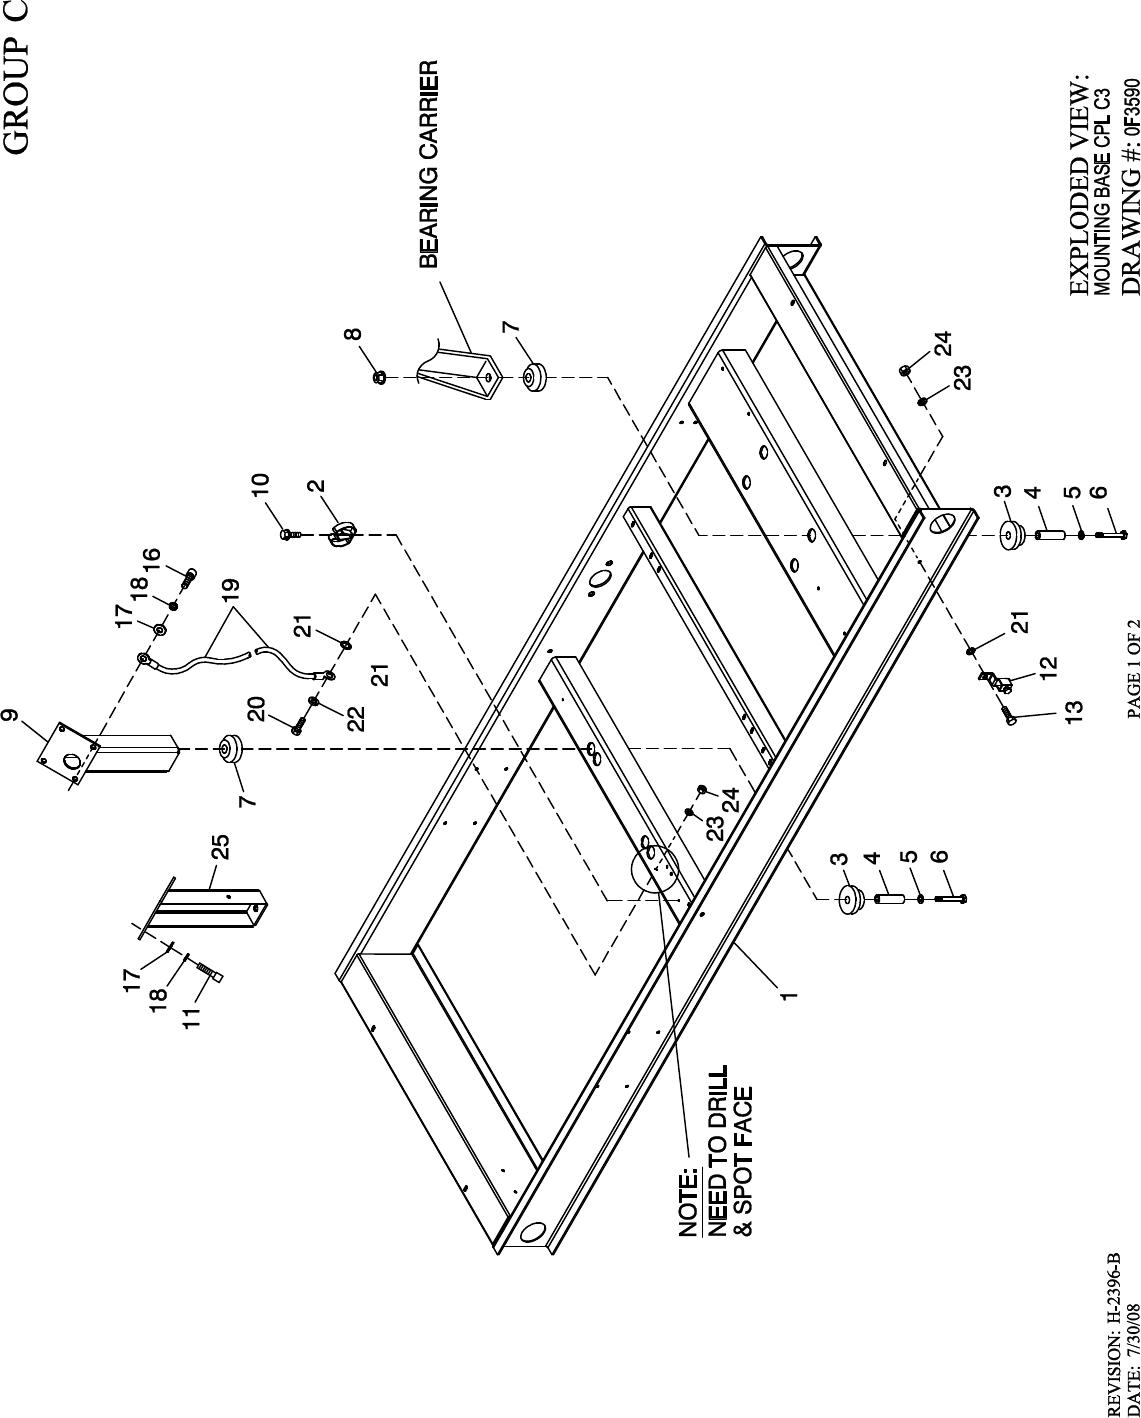 ford f6xf 18c830 ba 6cd changer wiring schematics wiring diagram Palfinger Wiring Diagrams wiring diagram ford f xf